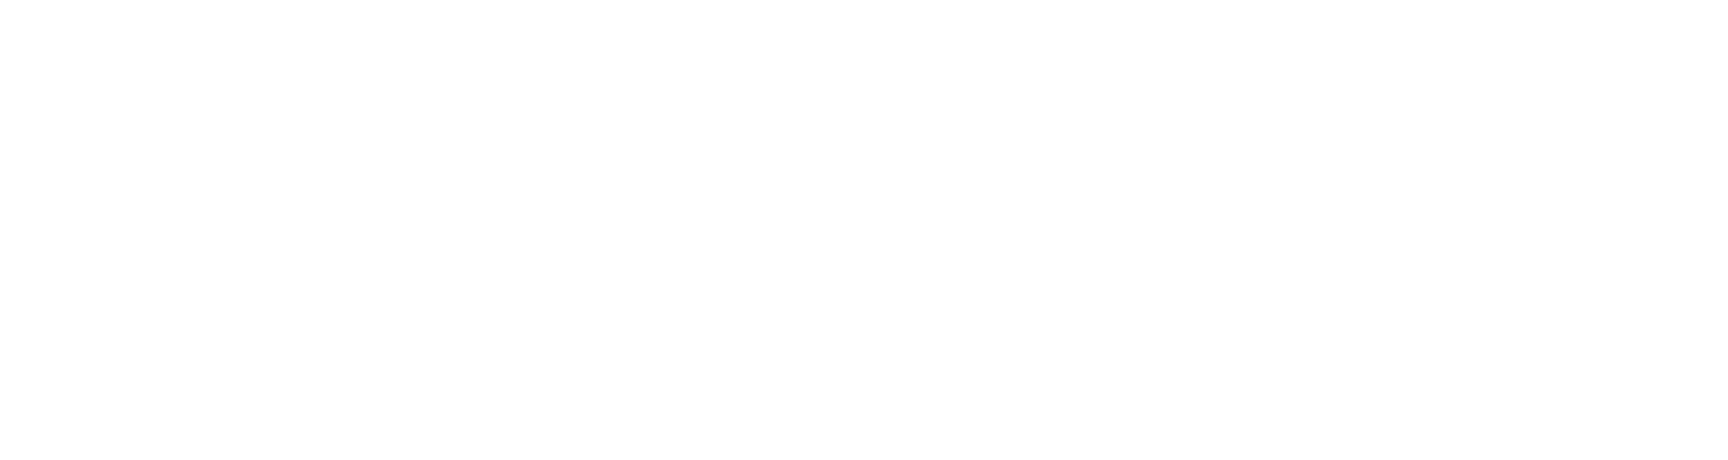 No Child, , ,